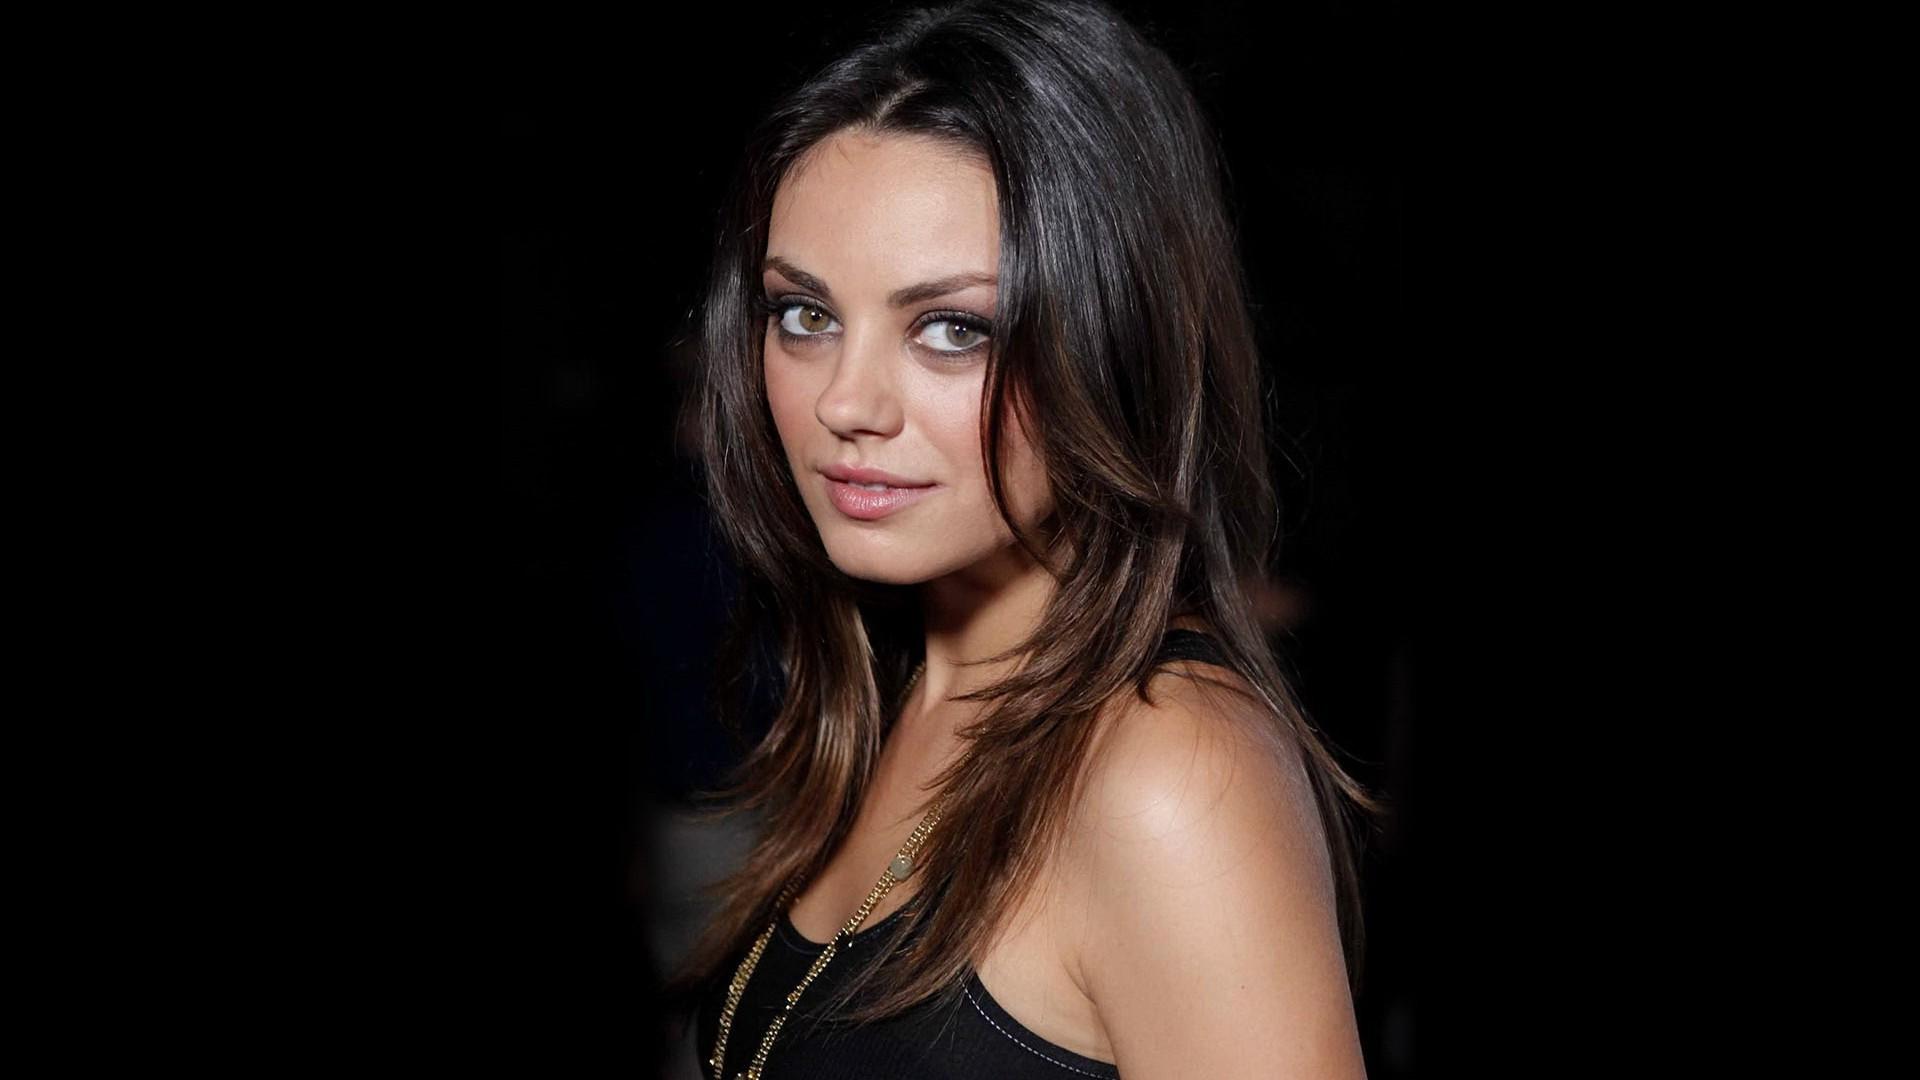 Mila Kunis Sexy Wallpapers